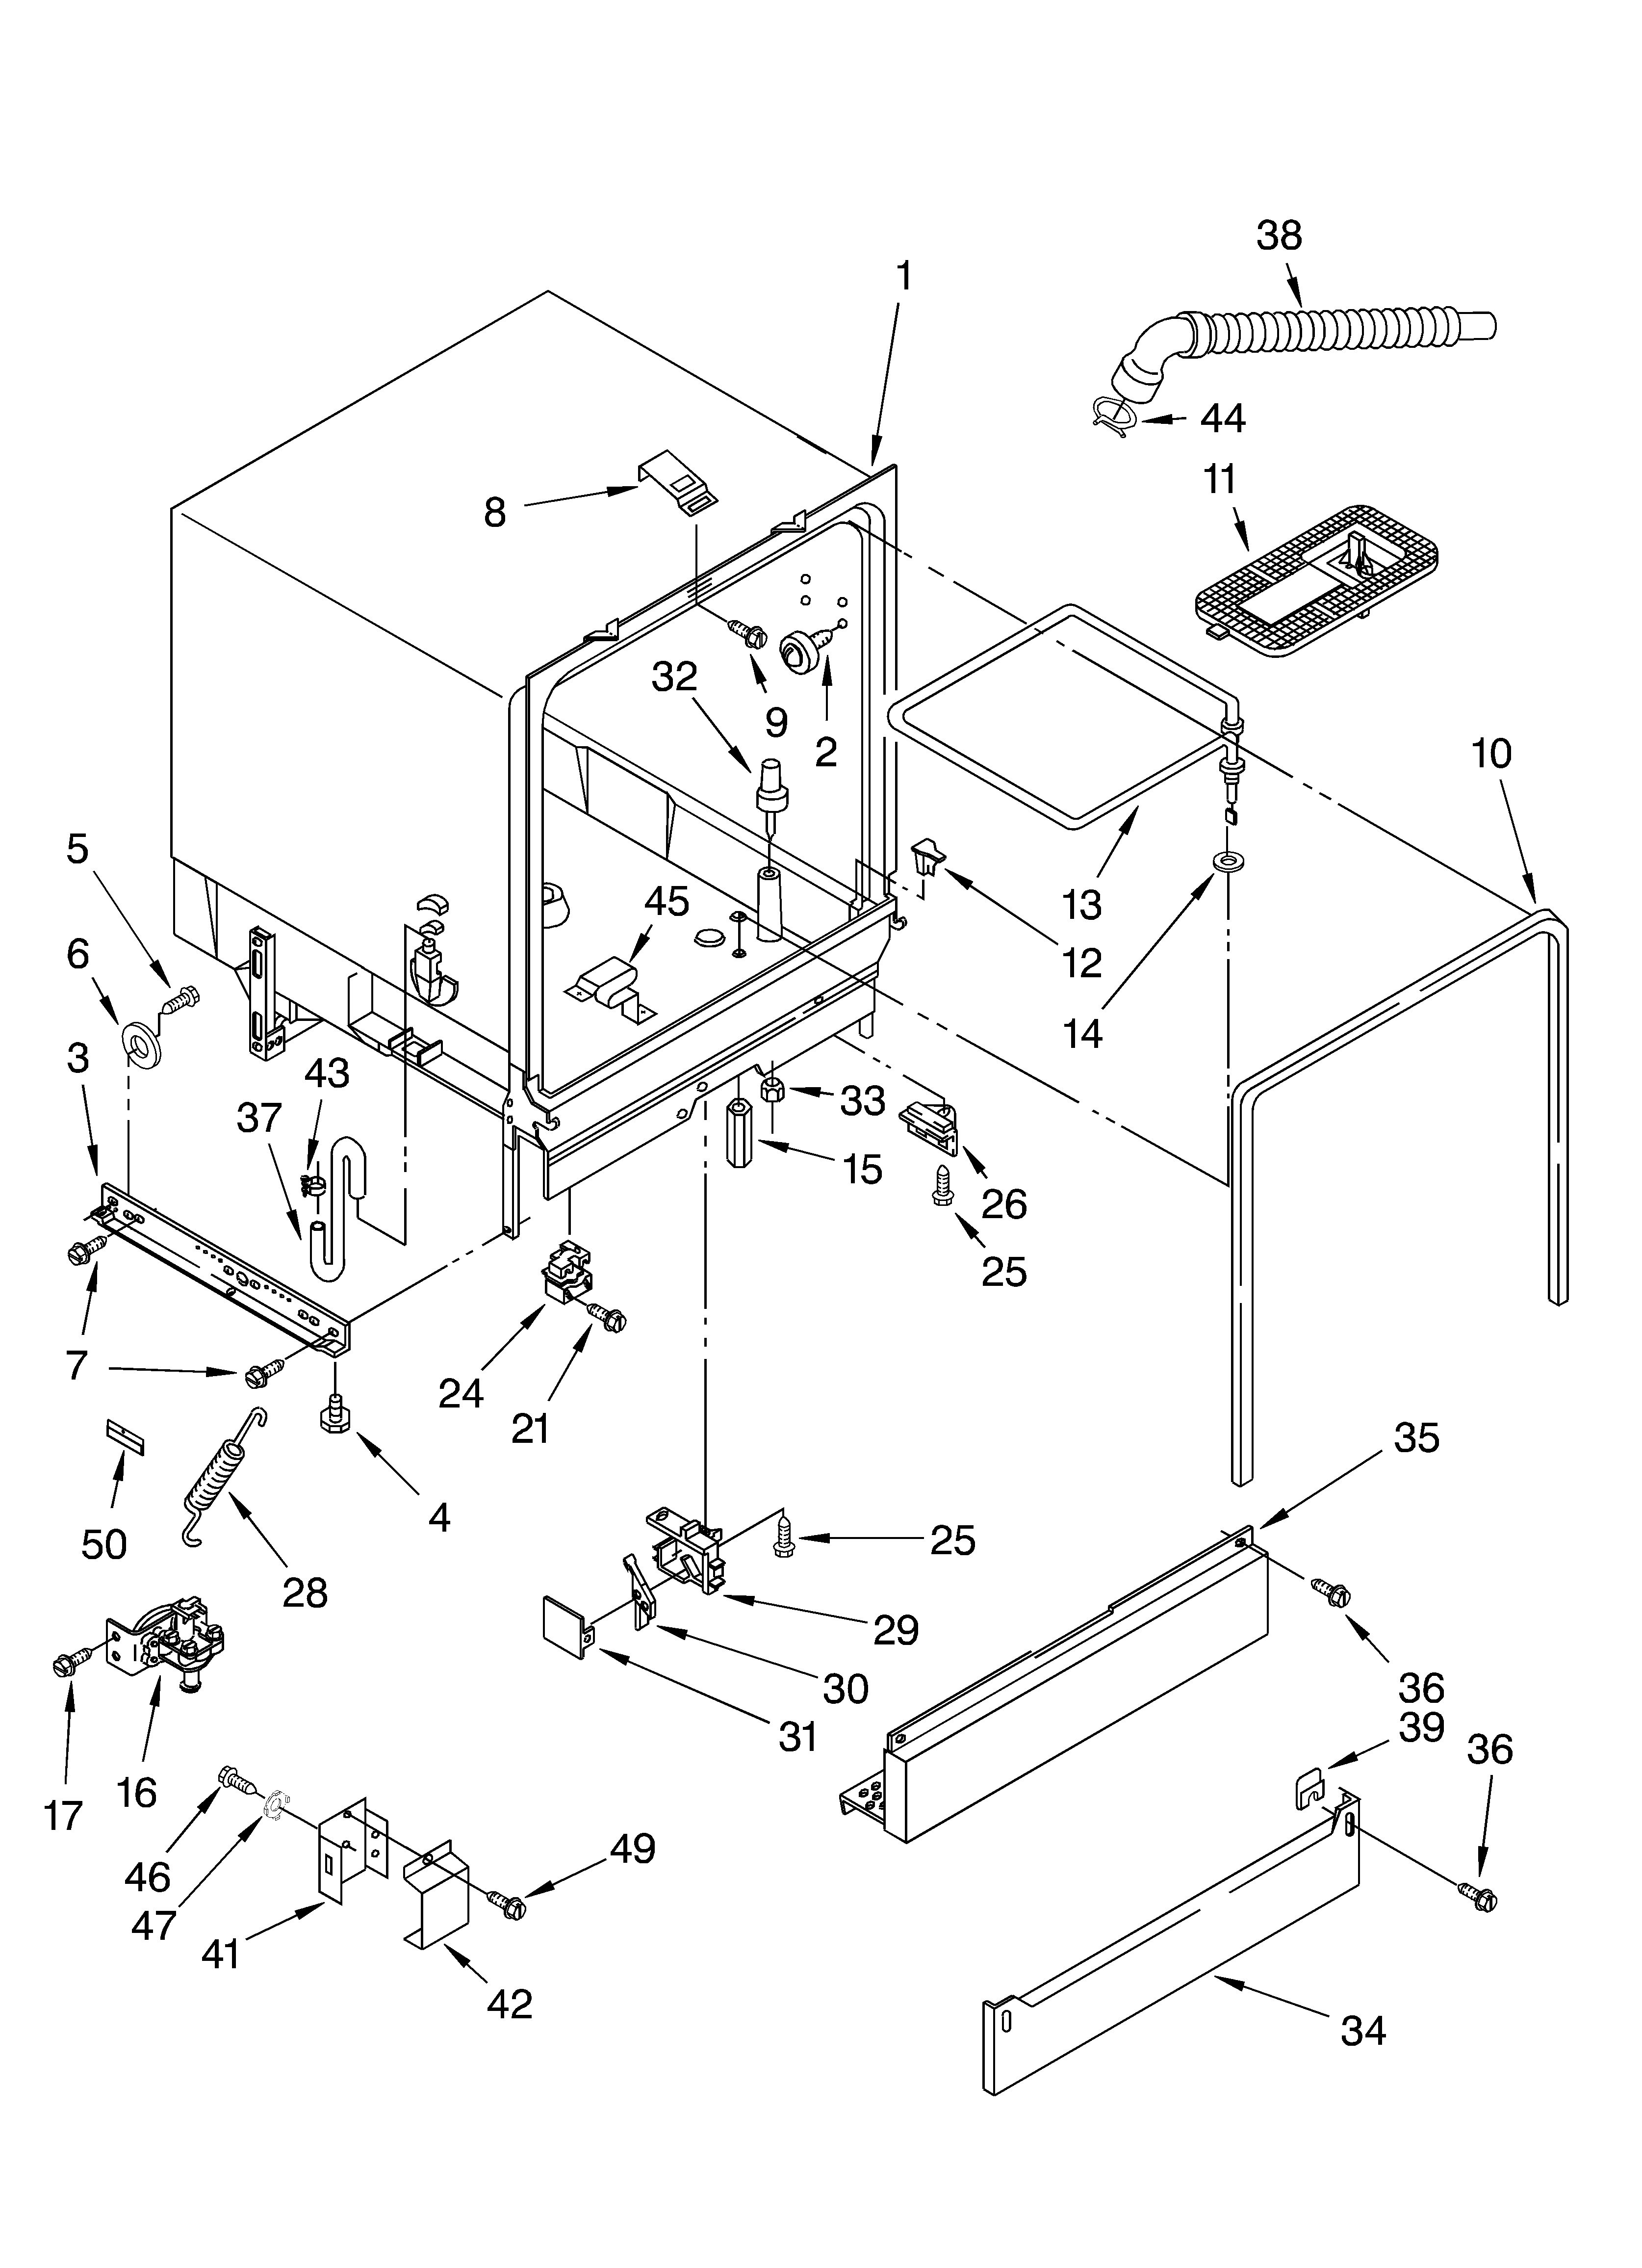 [DIAGRAM_3US]  LF_5018] Wiring Diagram Diagram And Parts List For Roper Dishwasherparts  Model Download Diagram   Roper Tractor Wiring Diagram      Funi Wigeg Mohammedshrine Librar Wiring 101